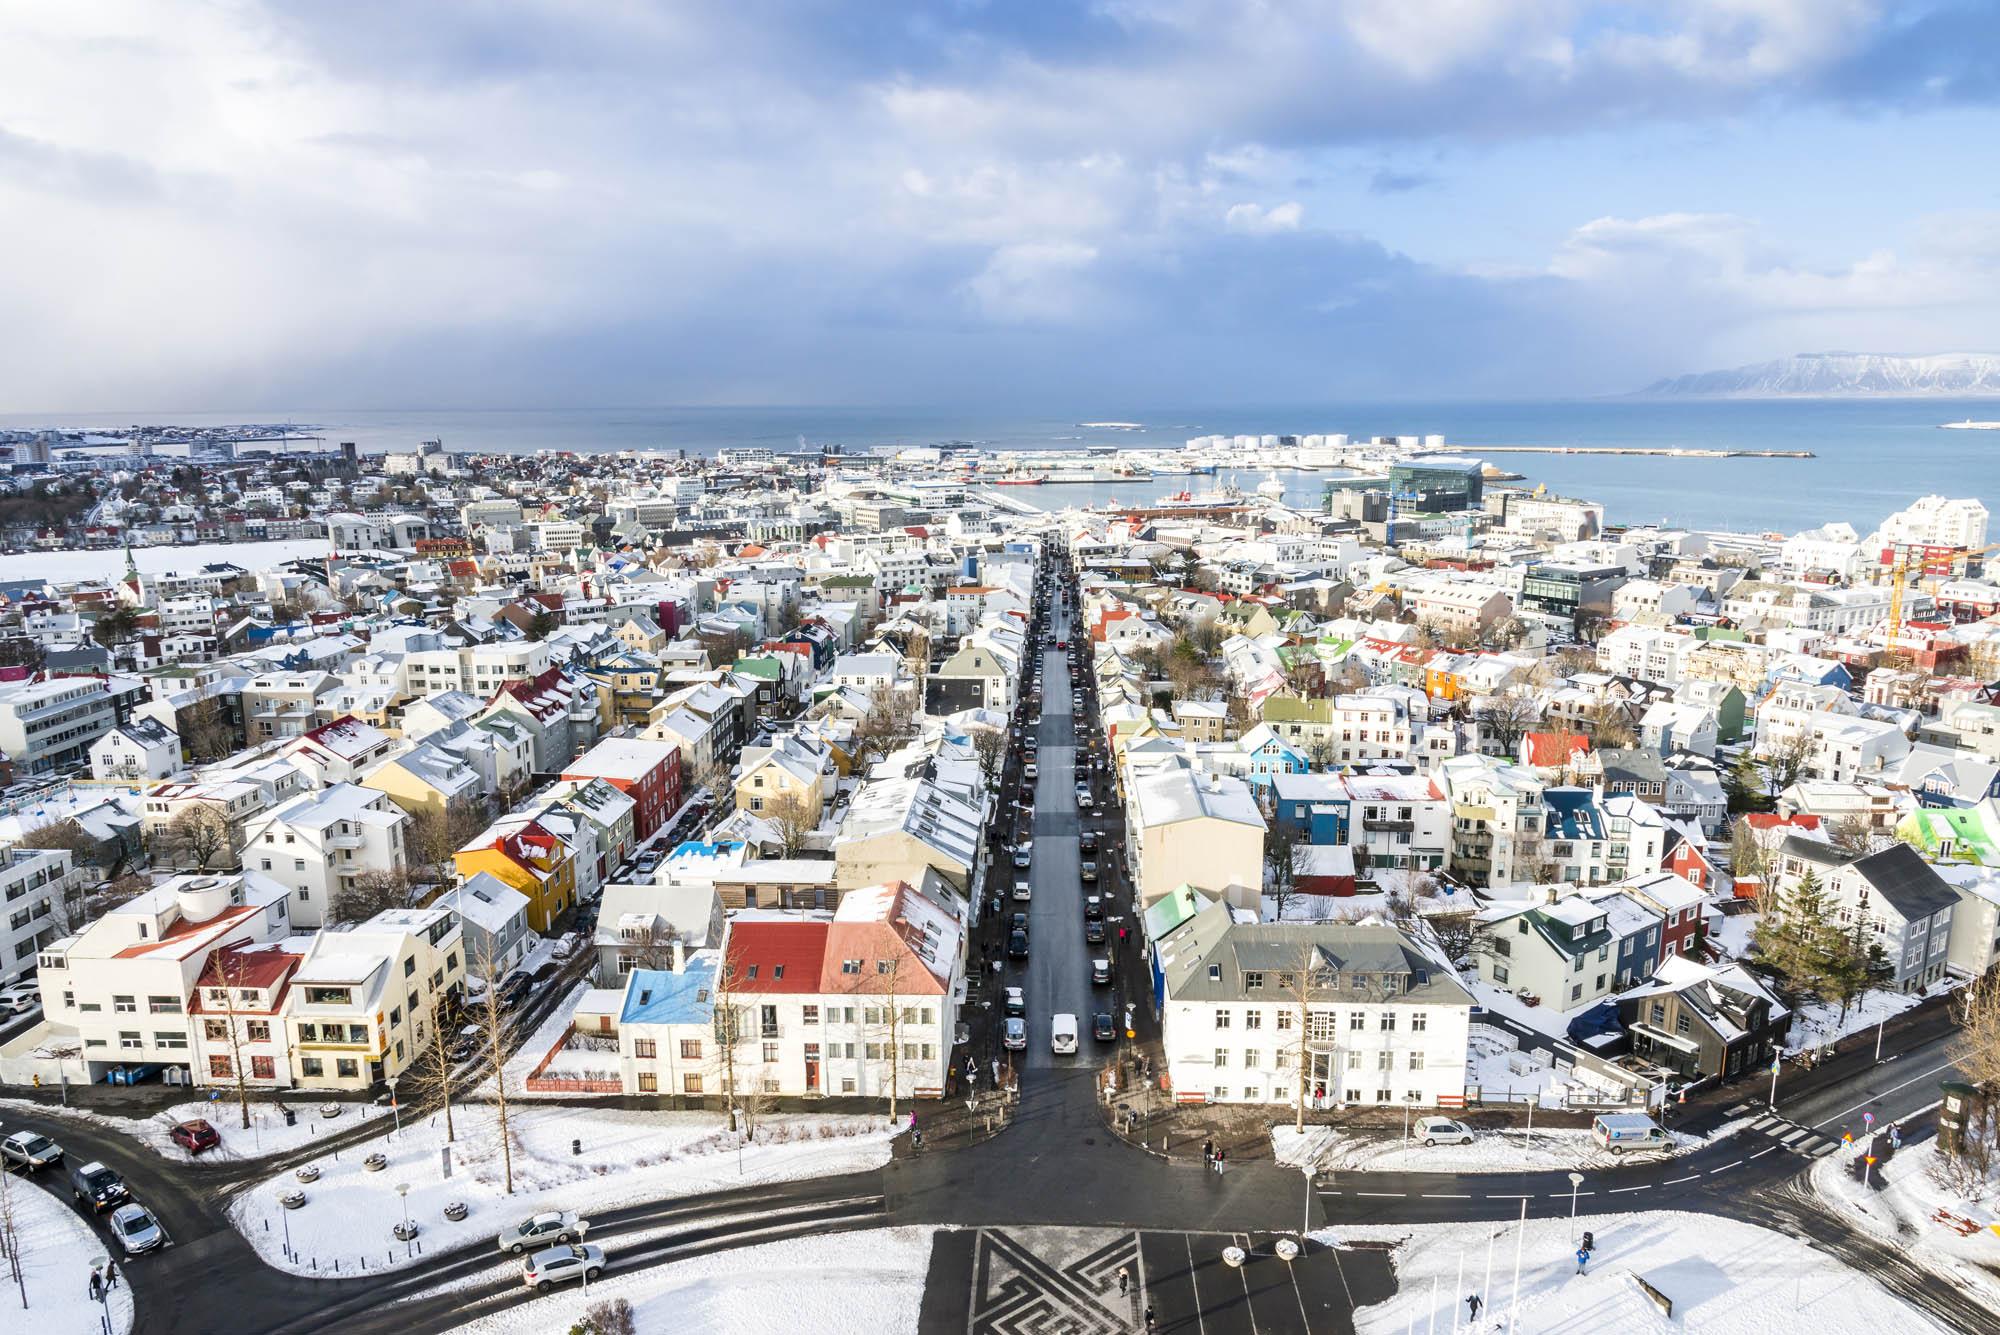 Reykjavik Winter View over Hallgrimskirkja